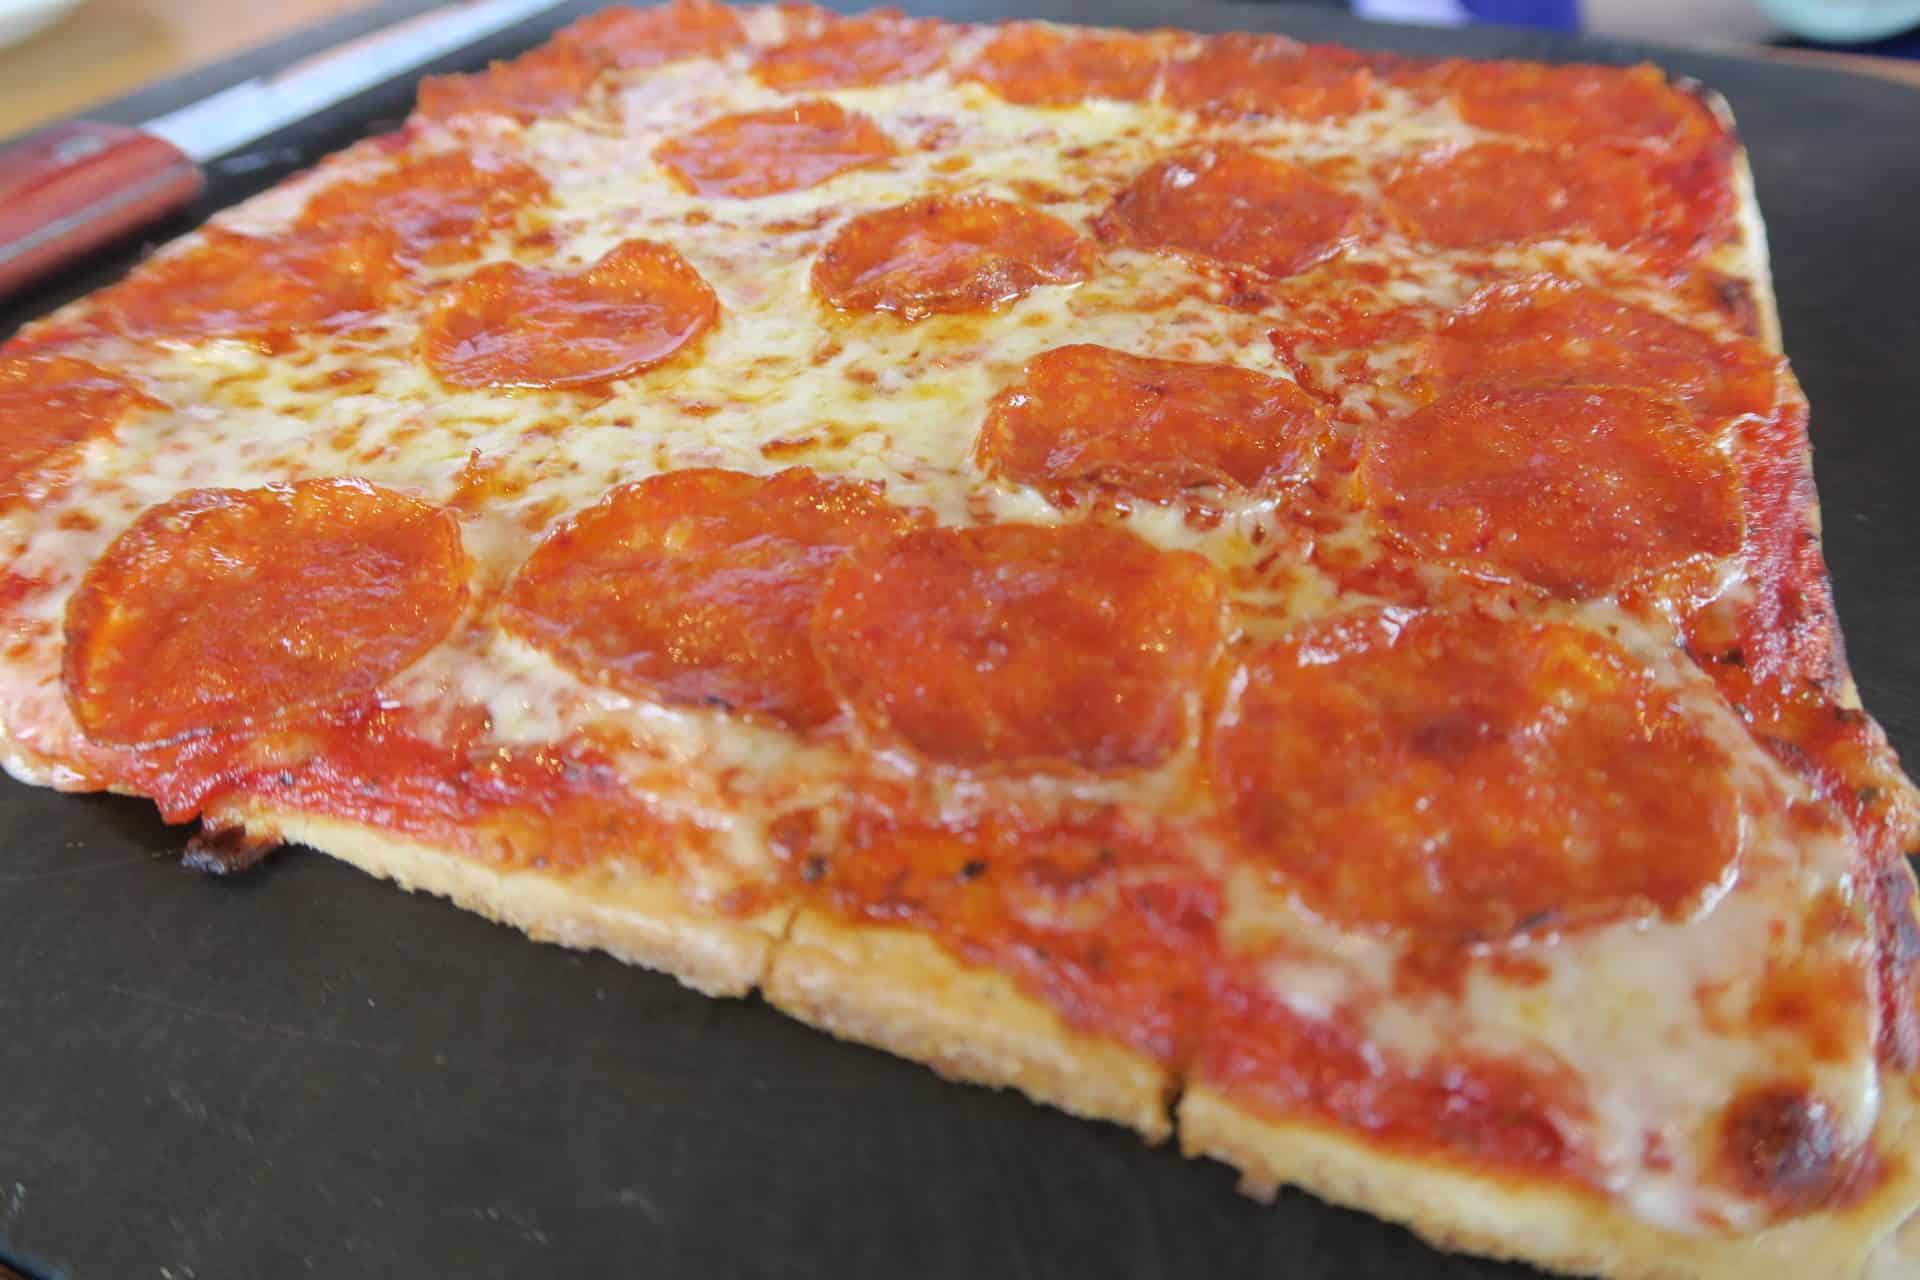 gluten-free-at-pizza-hut-pepperoni-pizza